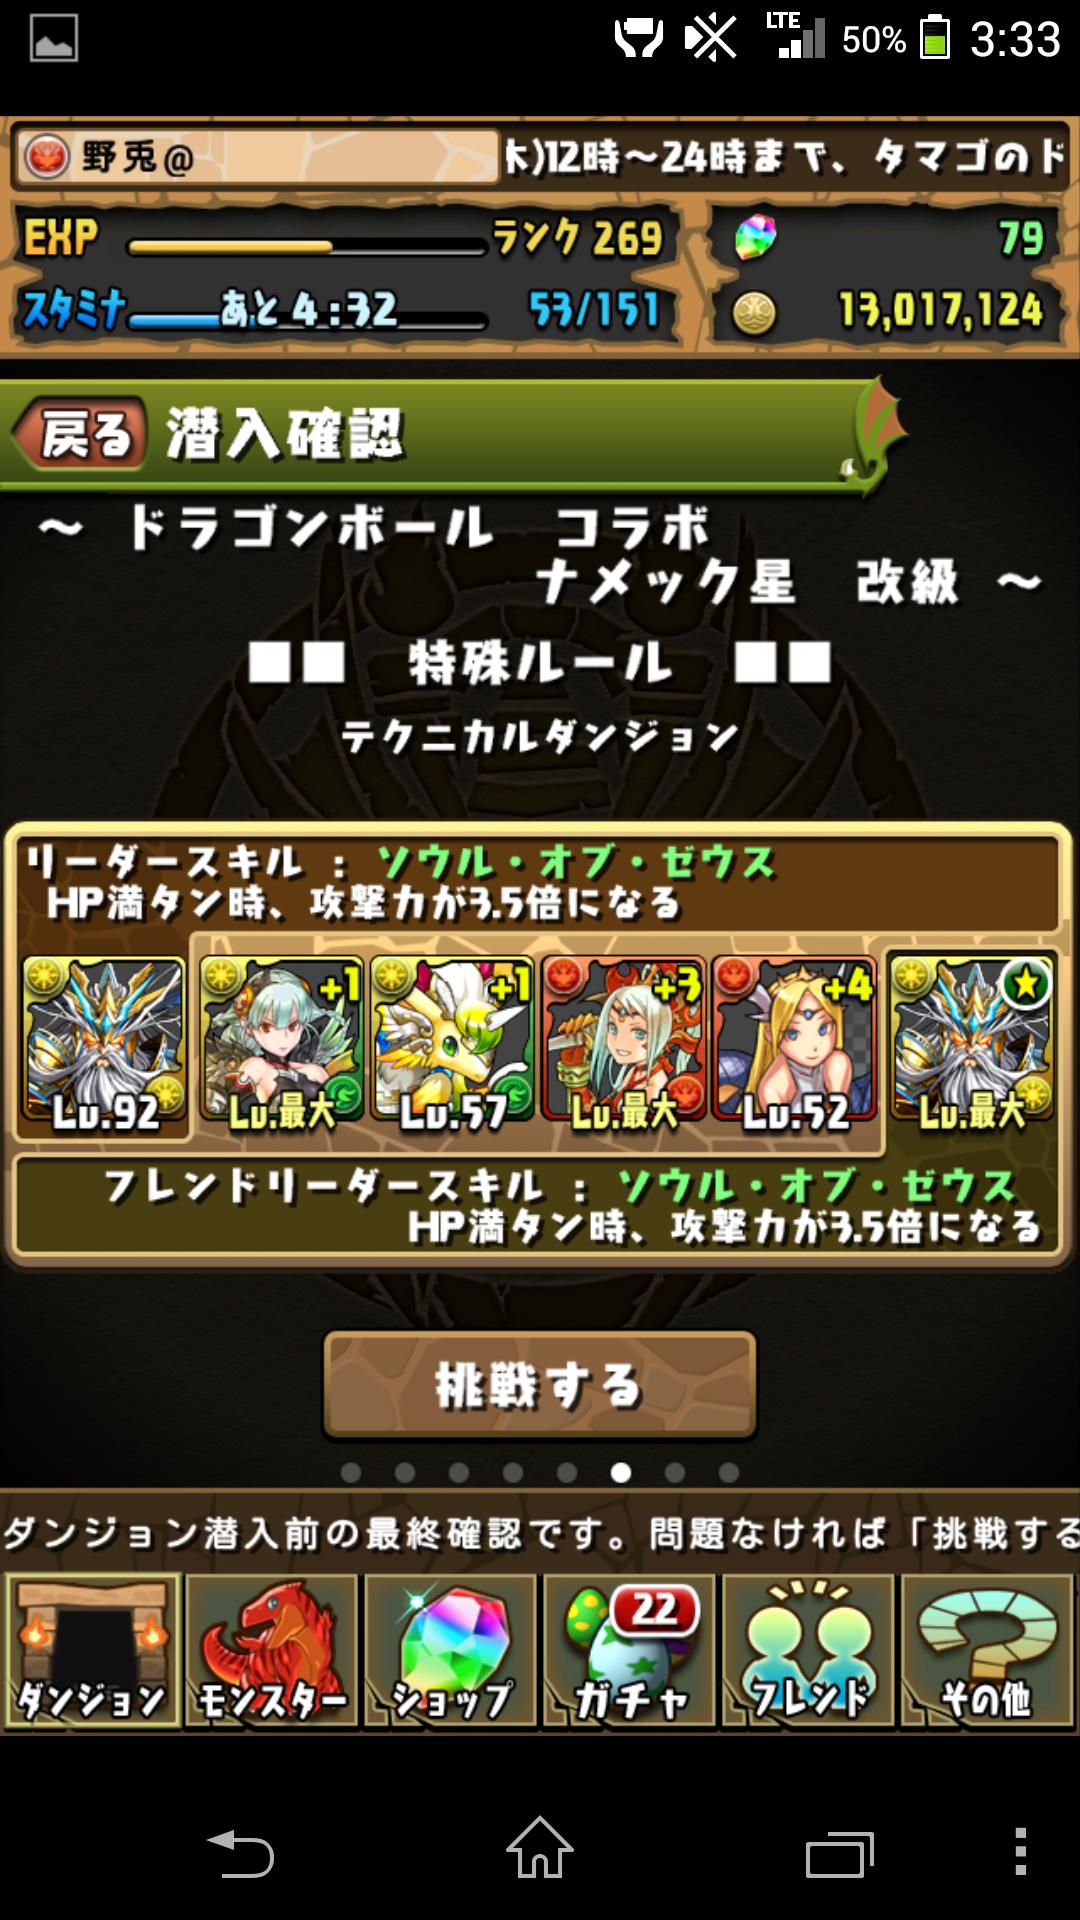 Screenshot_2014-06-06-03-33-49.png